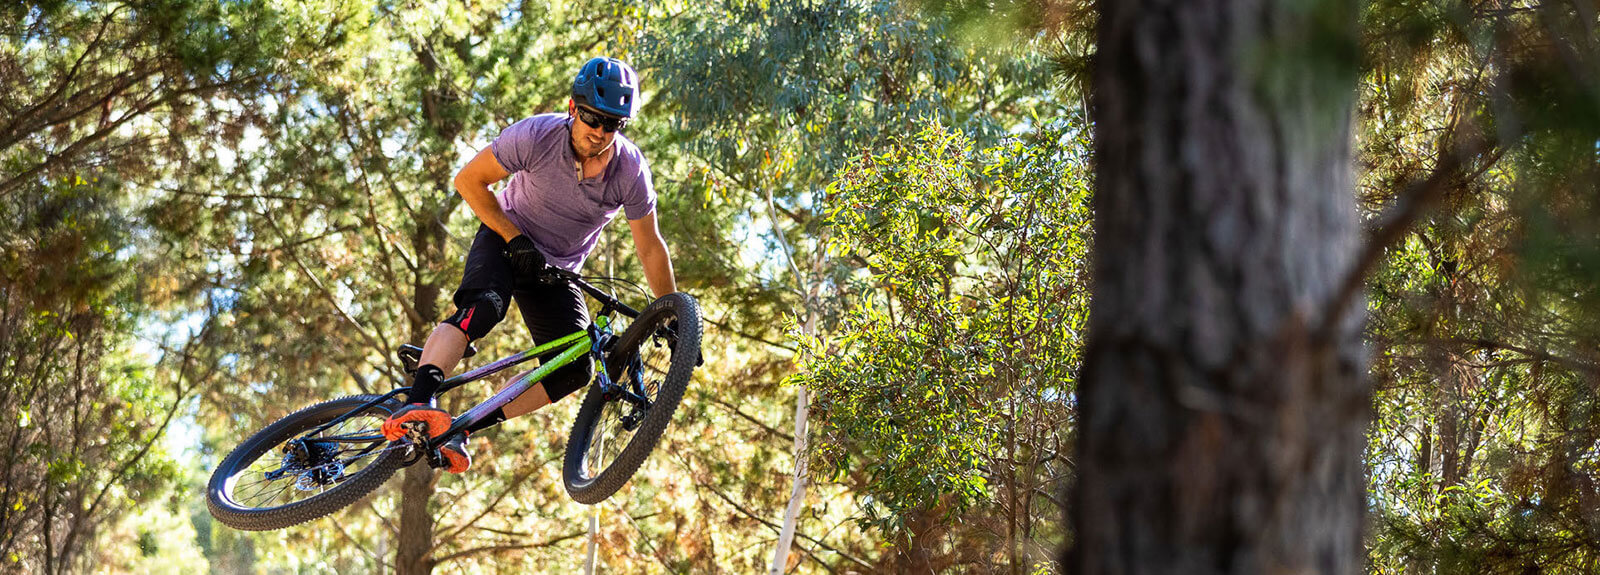 Perosn rides Electric Queen bike through green woods